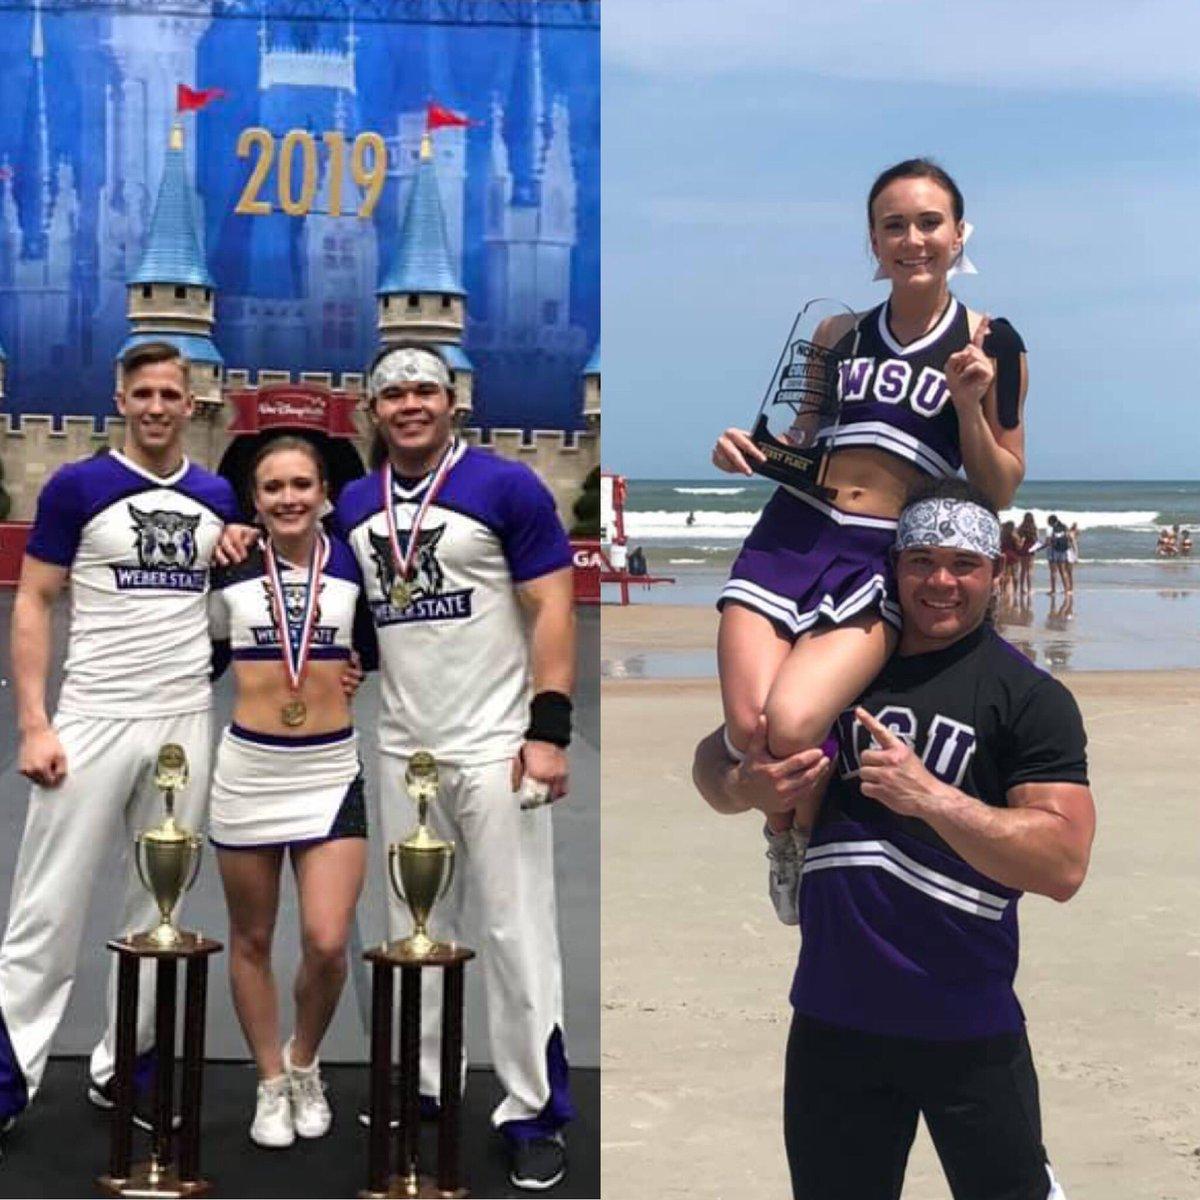 cd9ca42dd1b ... Central Cheer Alumni Mekenzie Grabau and her coed partner for winning  both the 2019 UCA and NCA Coed Partner Stunt National Championships this  season.